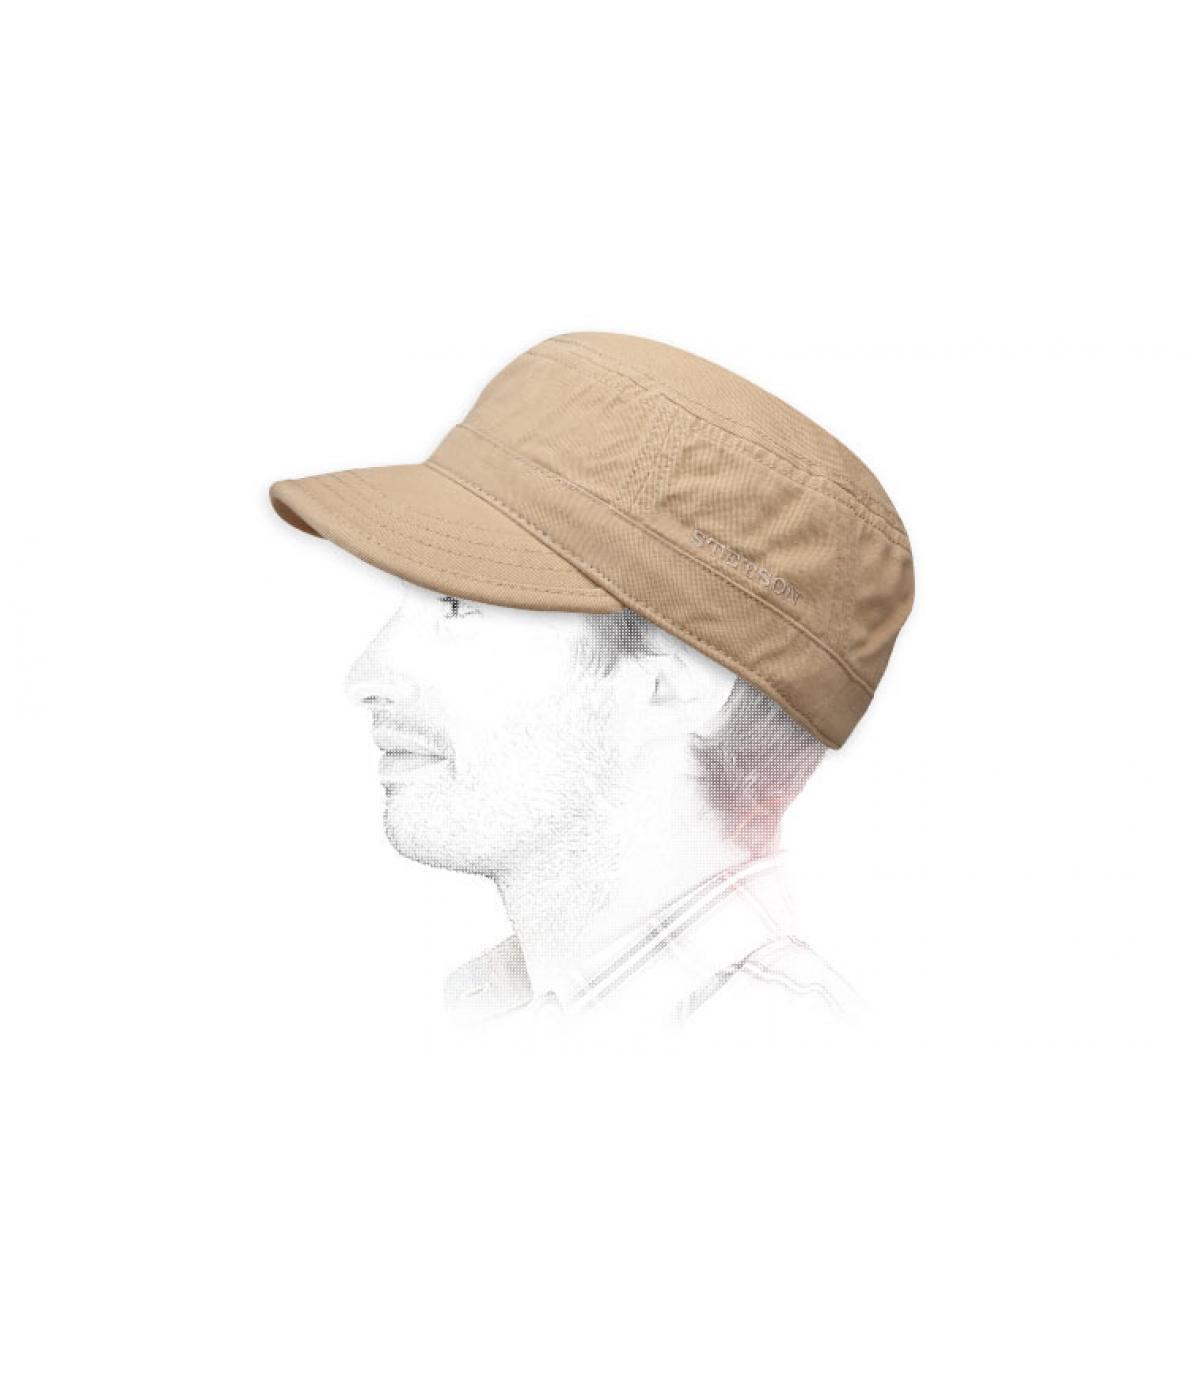 Détails Gosper beige - image 2